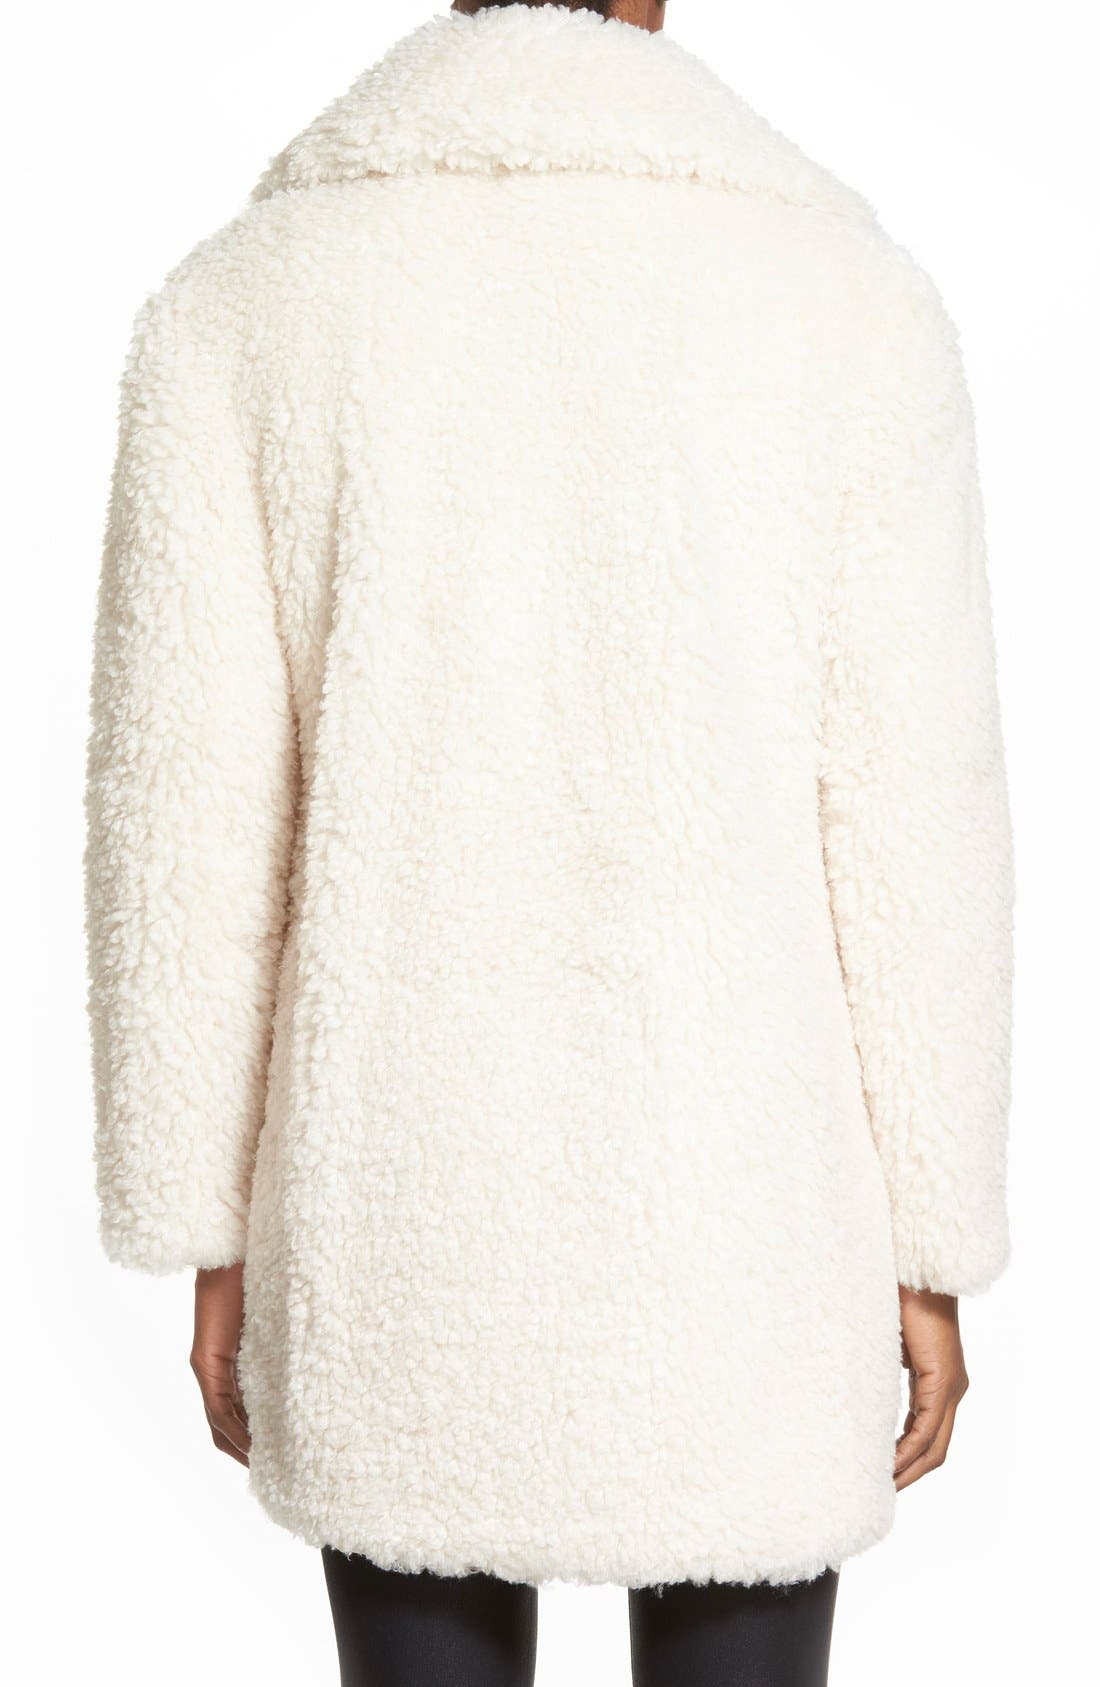 'Teddy Bear' Notch Collar Reversible Faux Fur Coat,                             Alternate thumbnail 15, color,